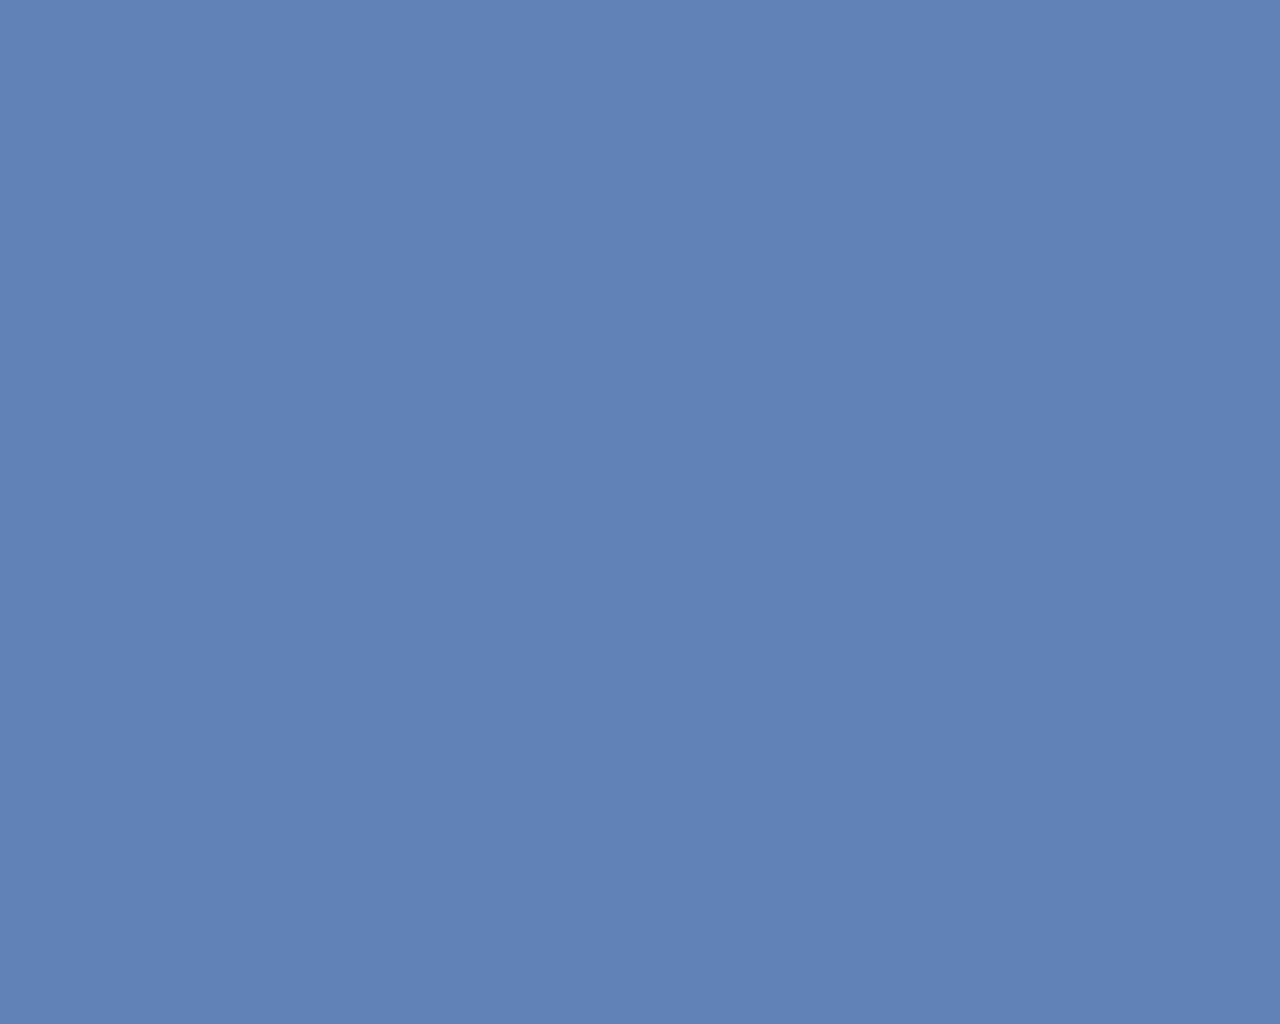 1280x1024 Glaucous Solid Color Background